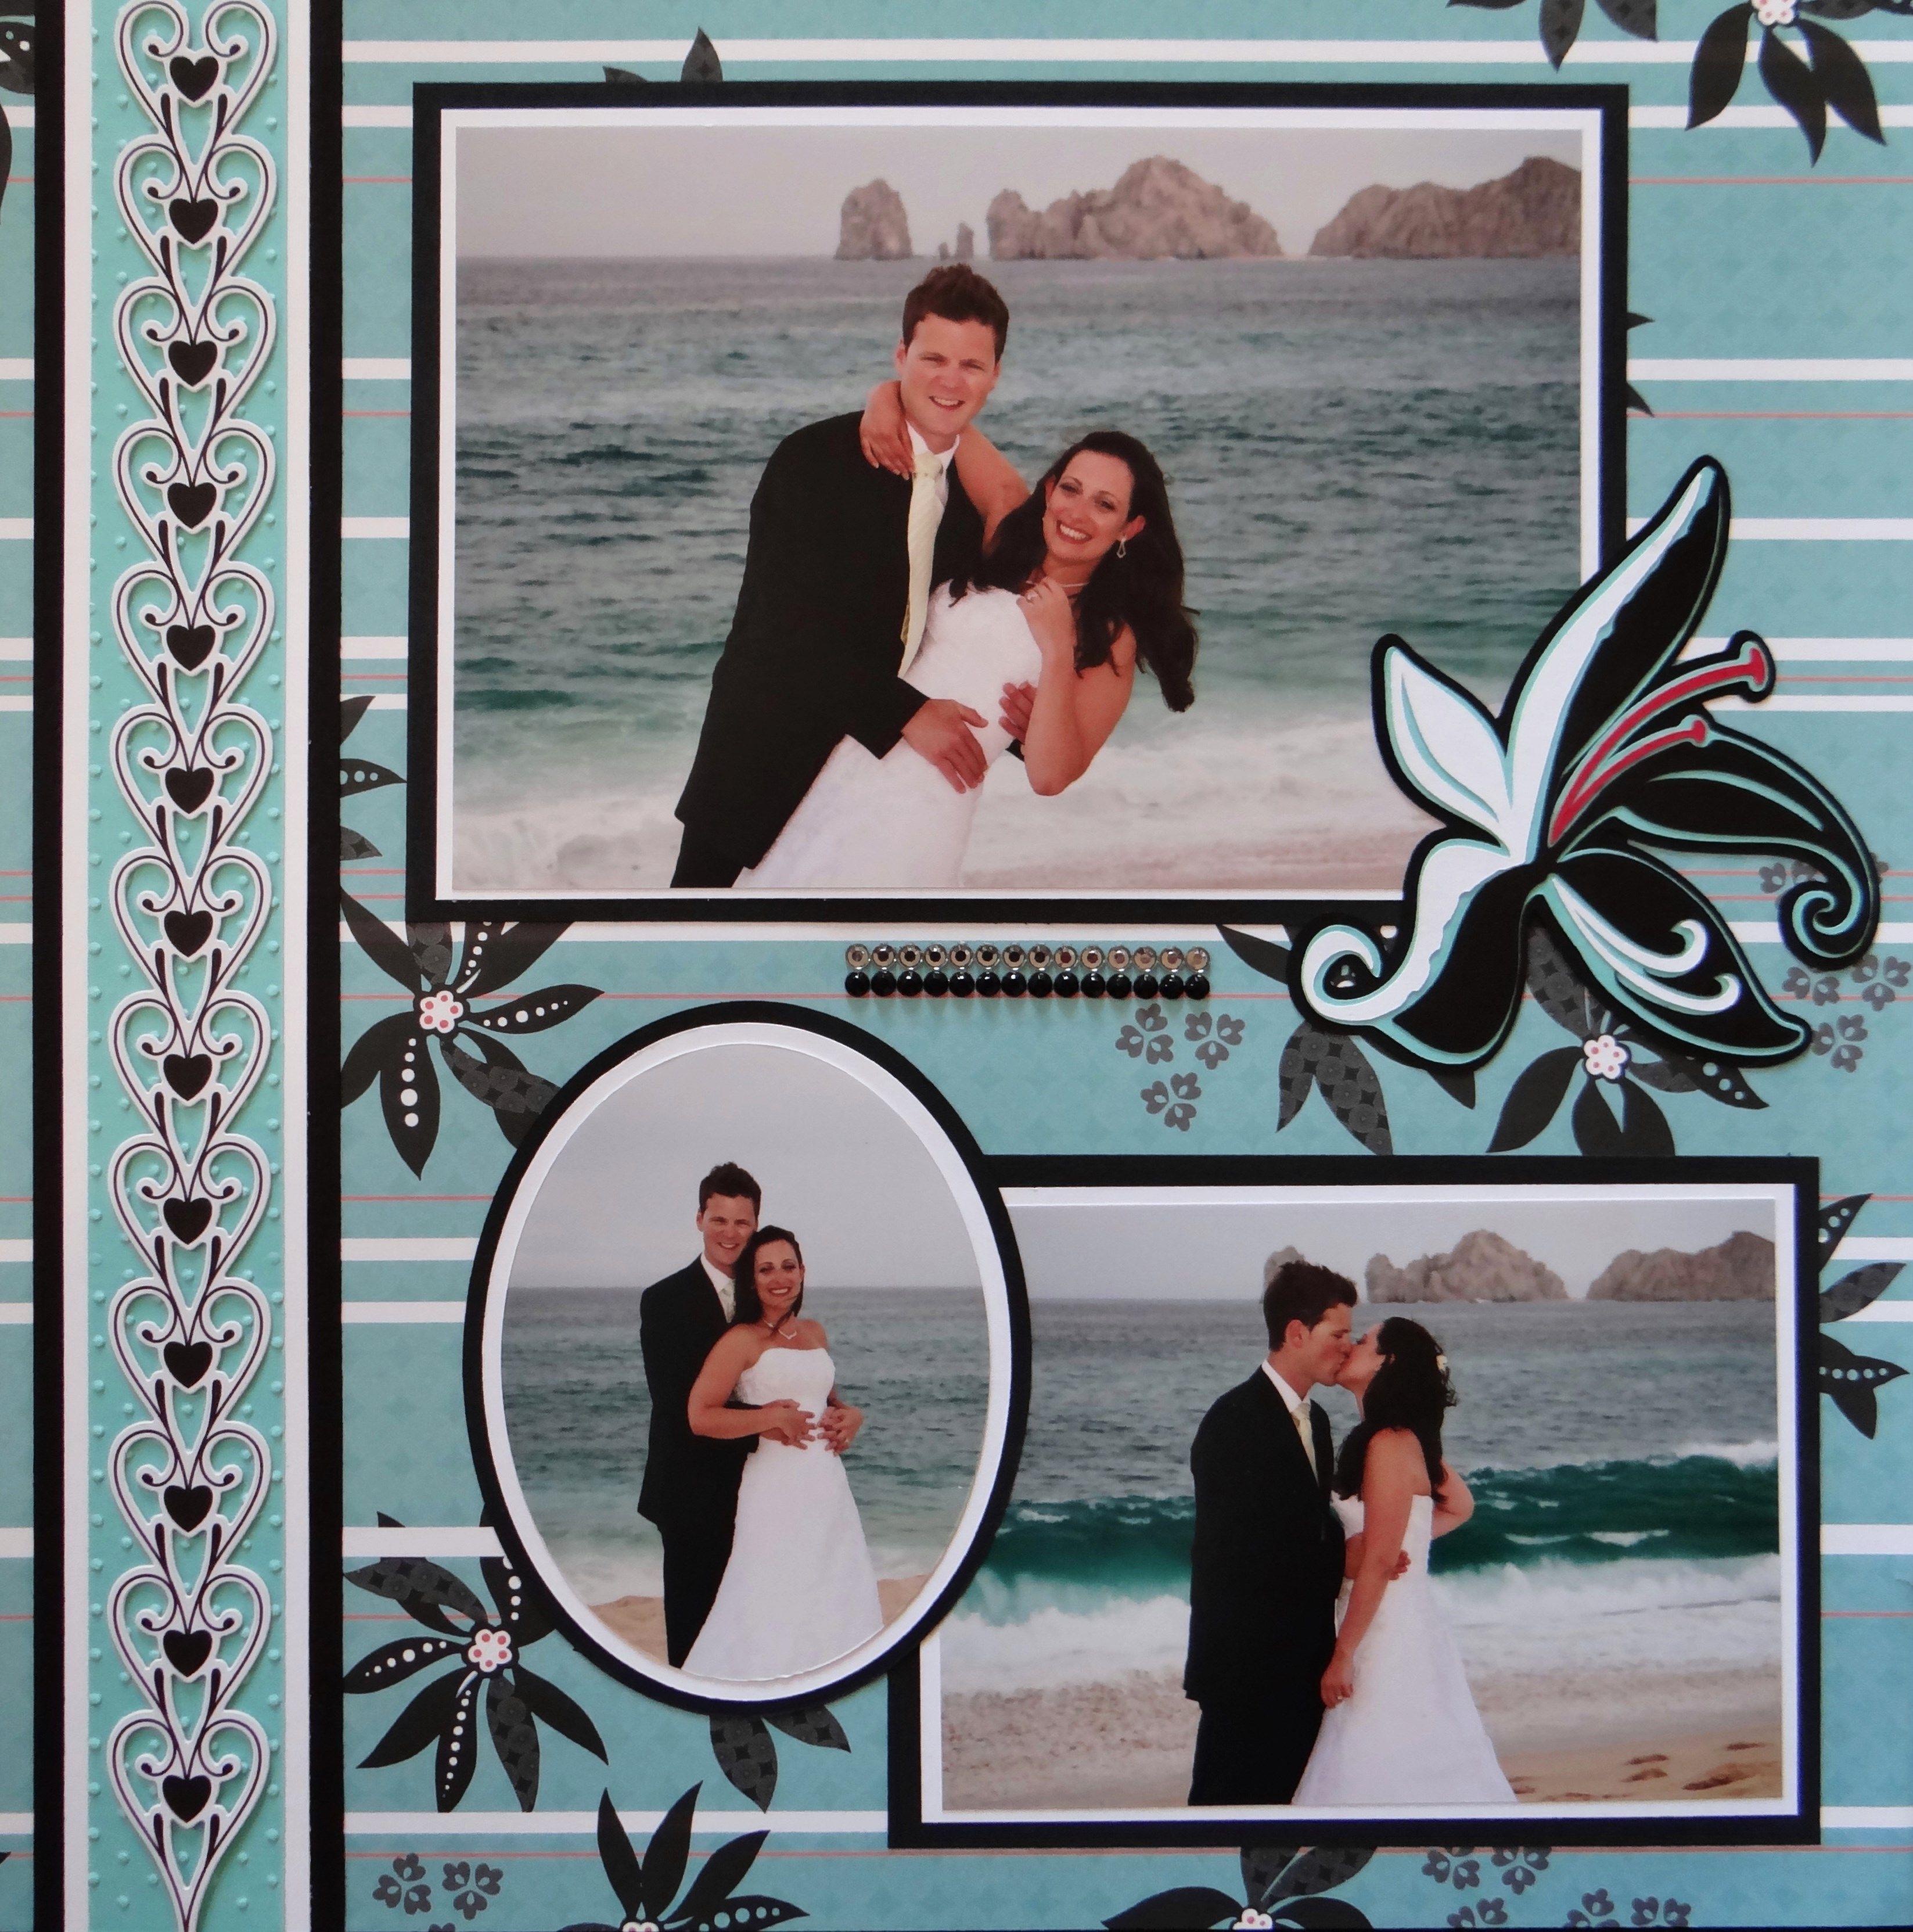 Beach Wedding - LHP - Scrapbook.com